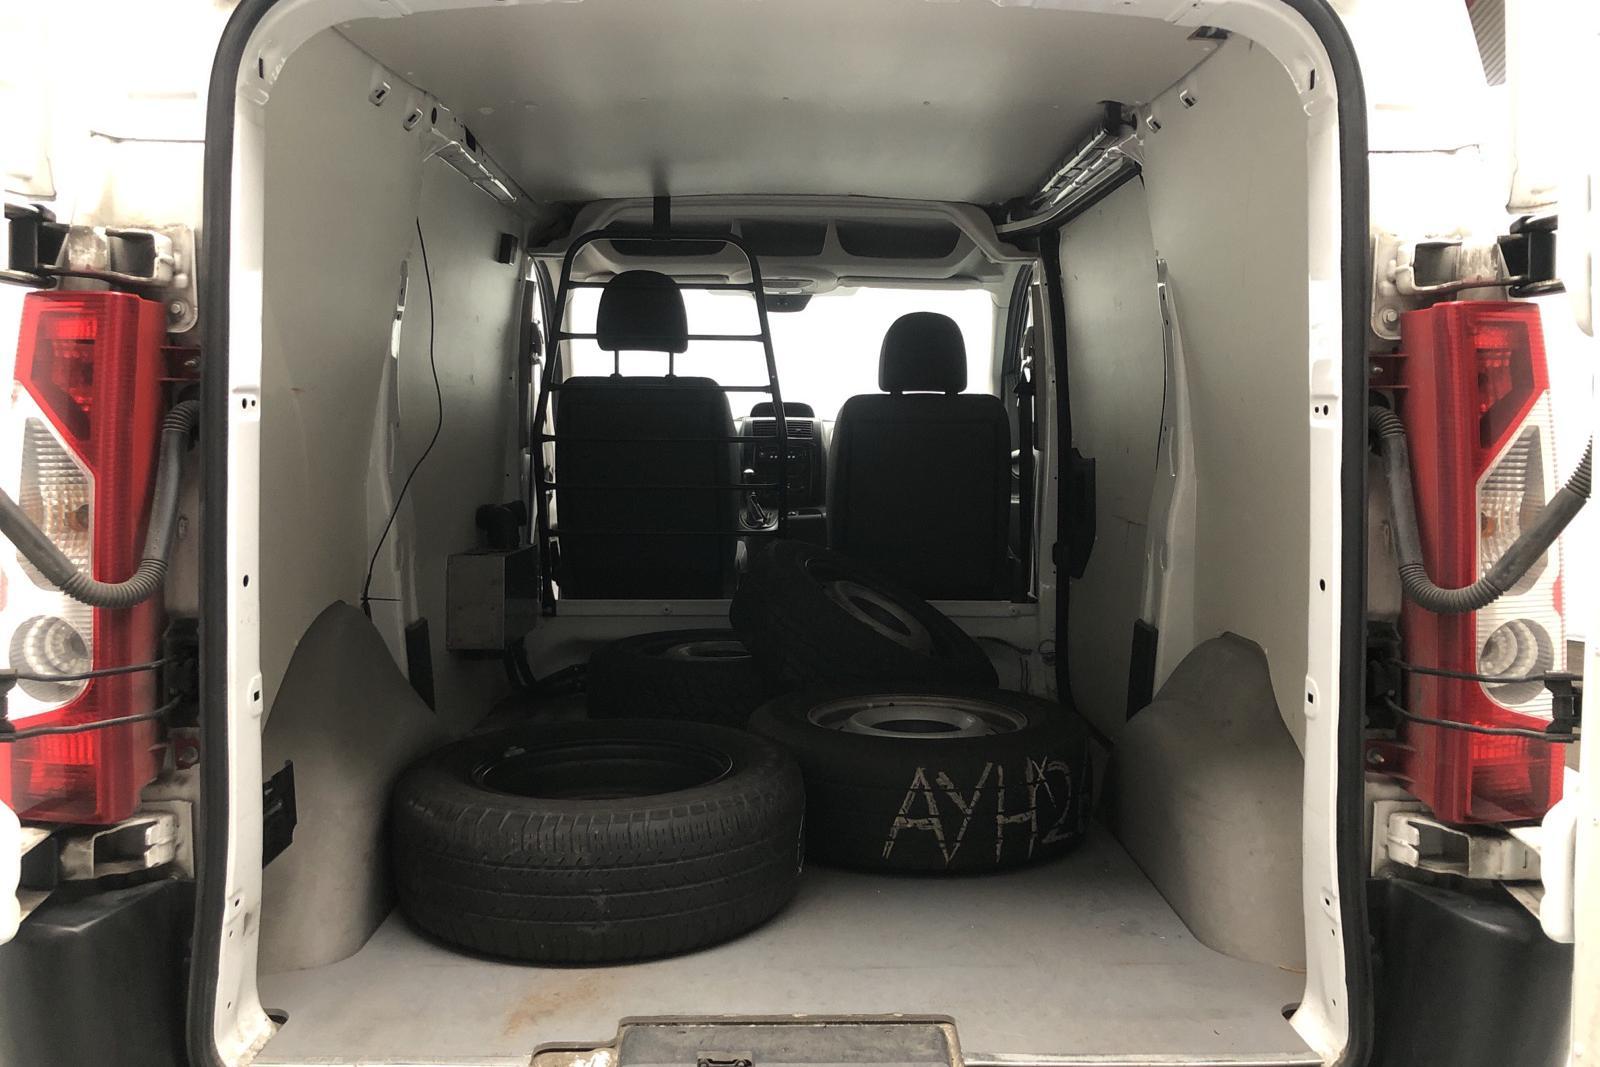 Fiat Scudo 1.6 MJT (90hk) - 243 320 km - Manual - white - 2014